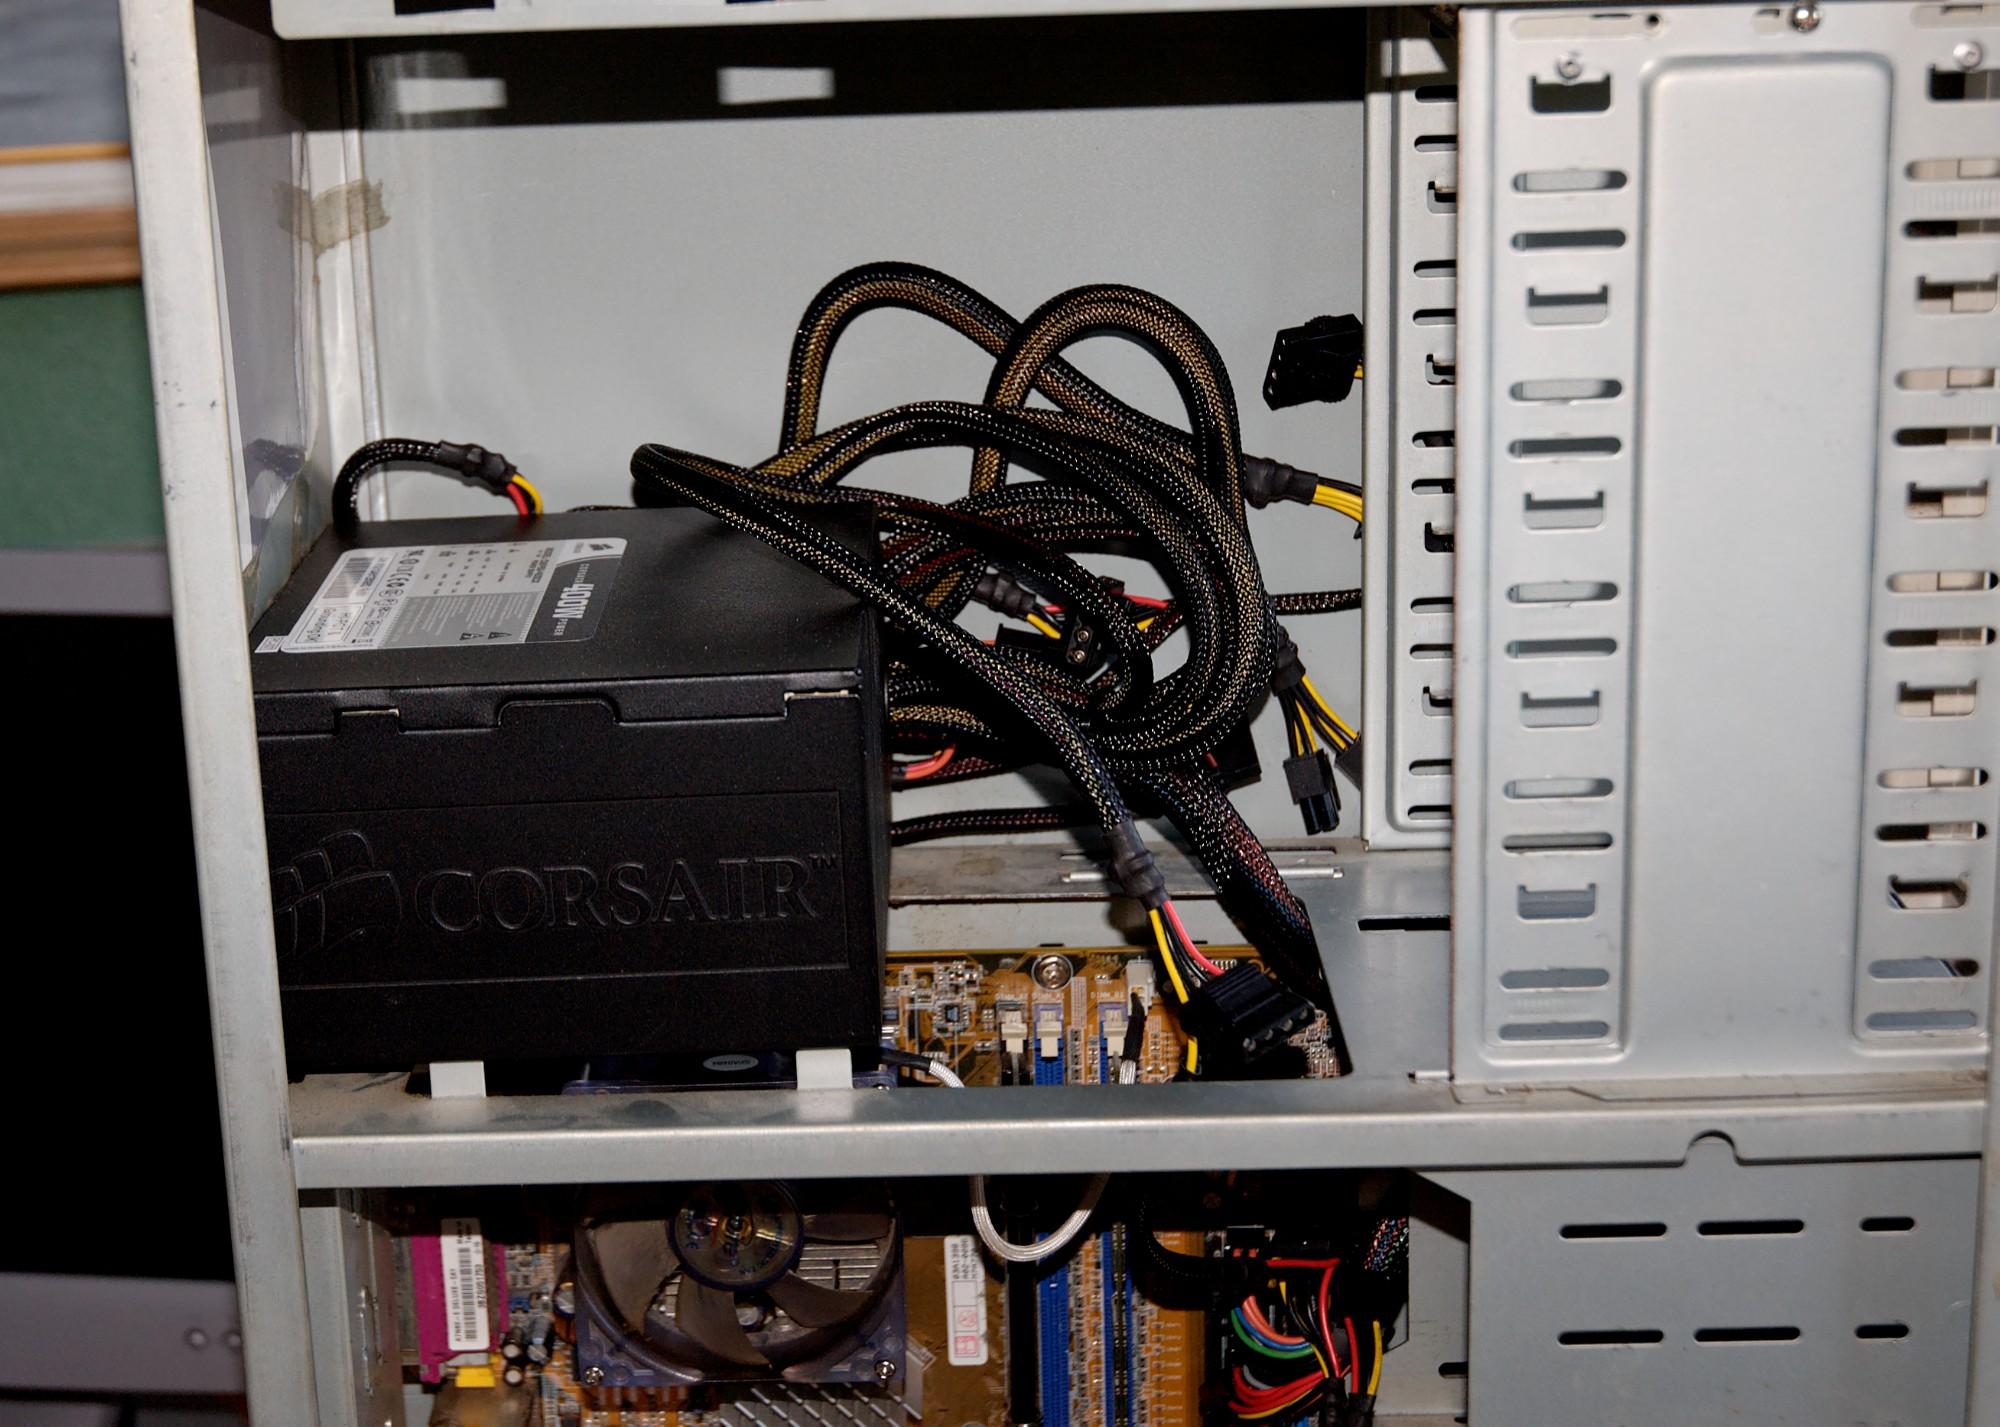 DSC 9359 raw